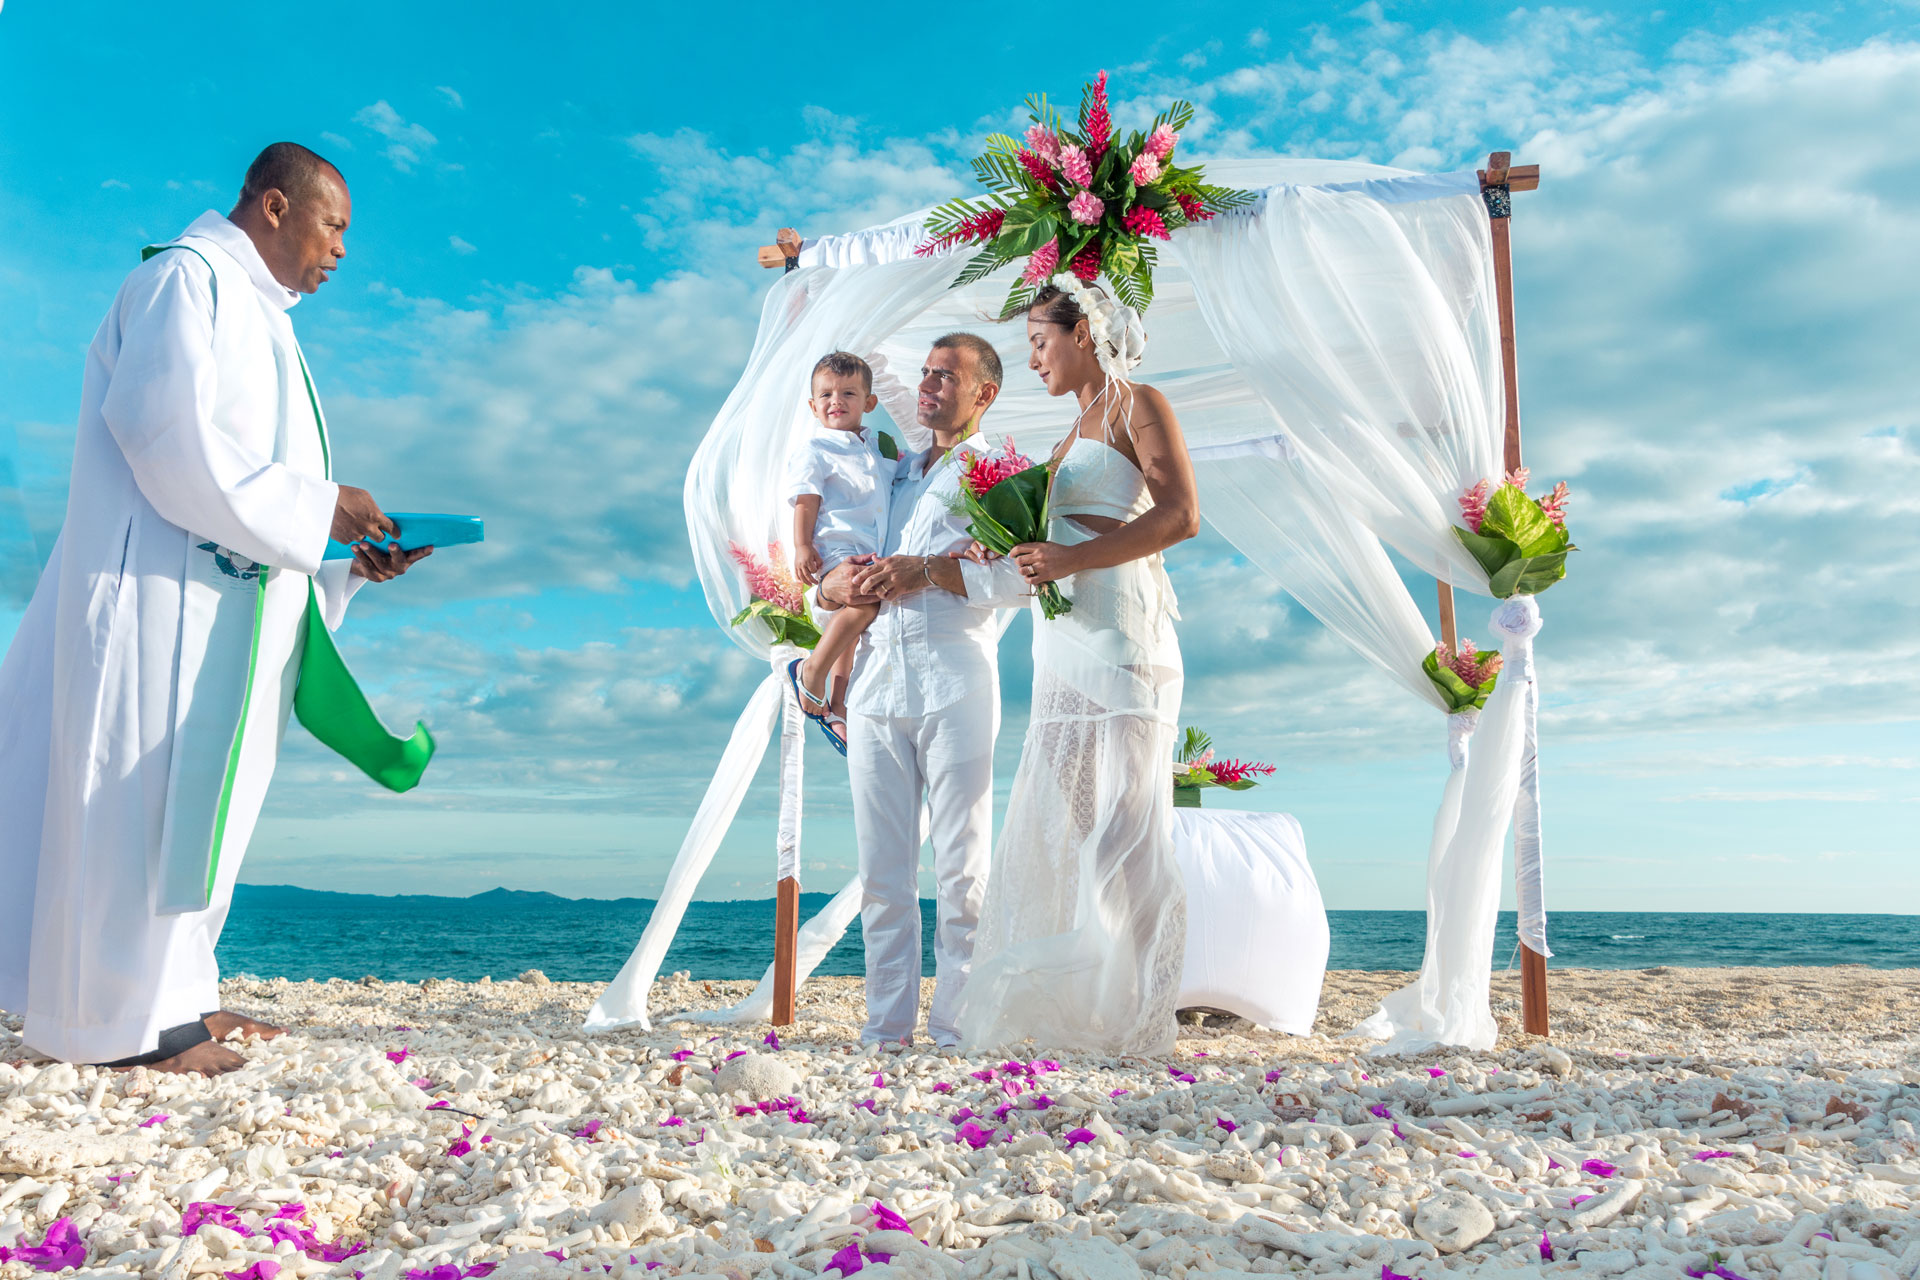 Matrimonio Simbolico Promesse : Viaggio di nozze madagascar rinnovo promesse andilana beach resort